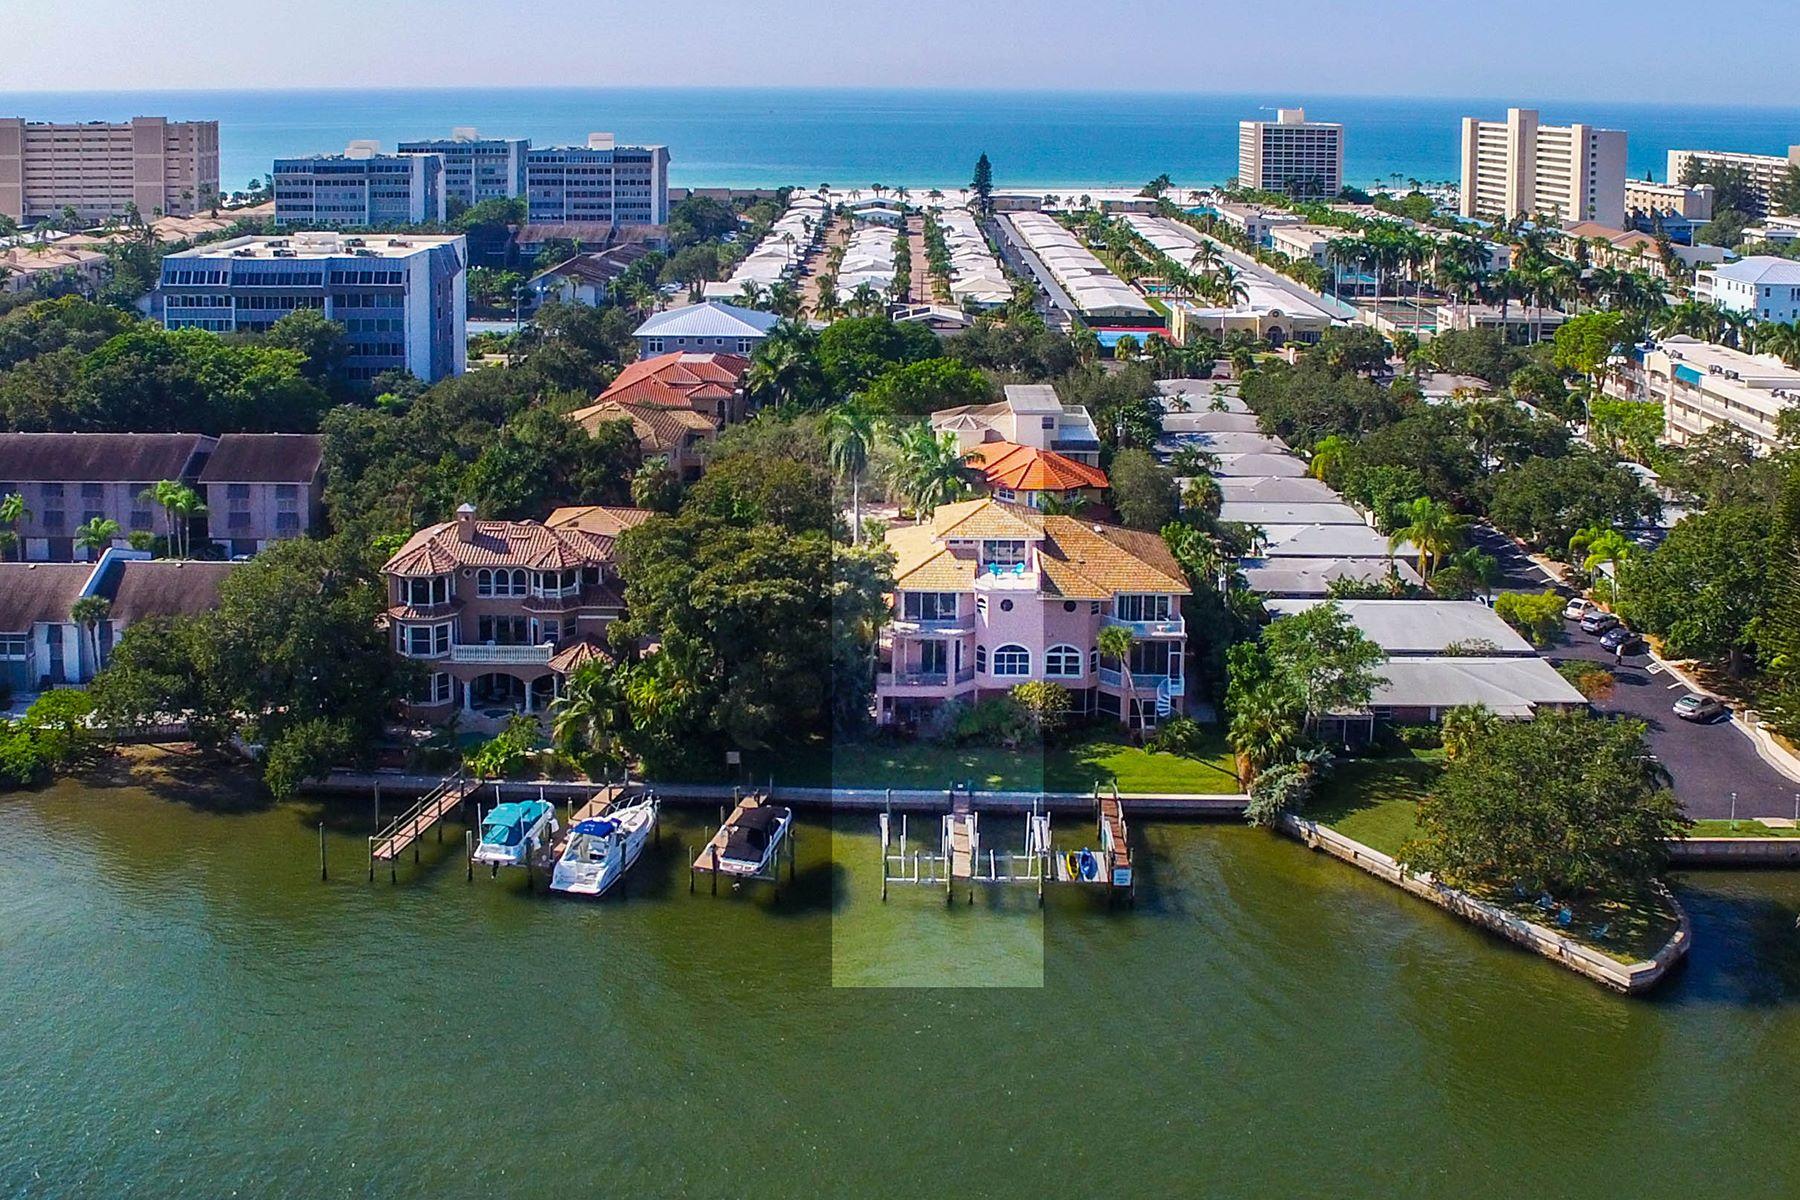 Condomínio para Venda às SIESTA KEY 1245 Derby Ln A Sarasota, Florida, 34242 Estados Unidos